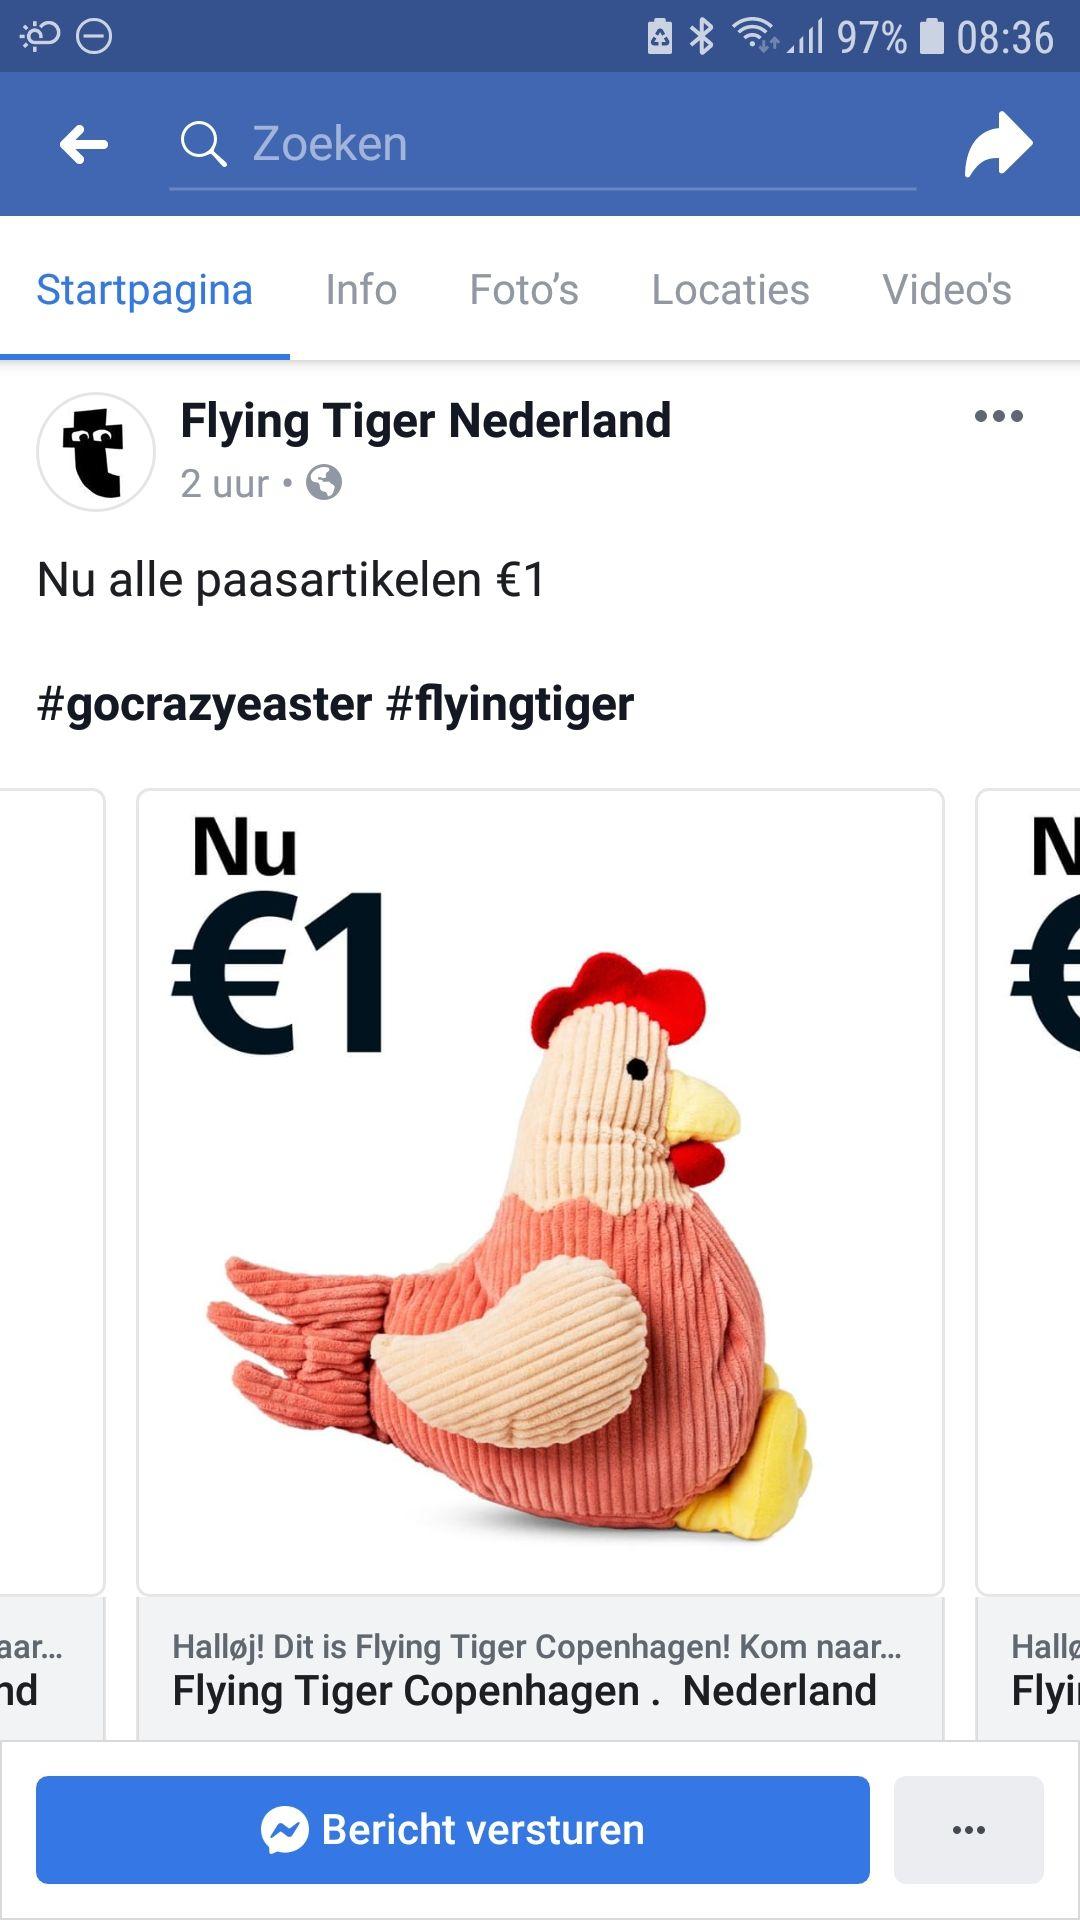 Flying Tiger - alle paasartikelen 1 euro